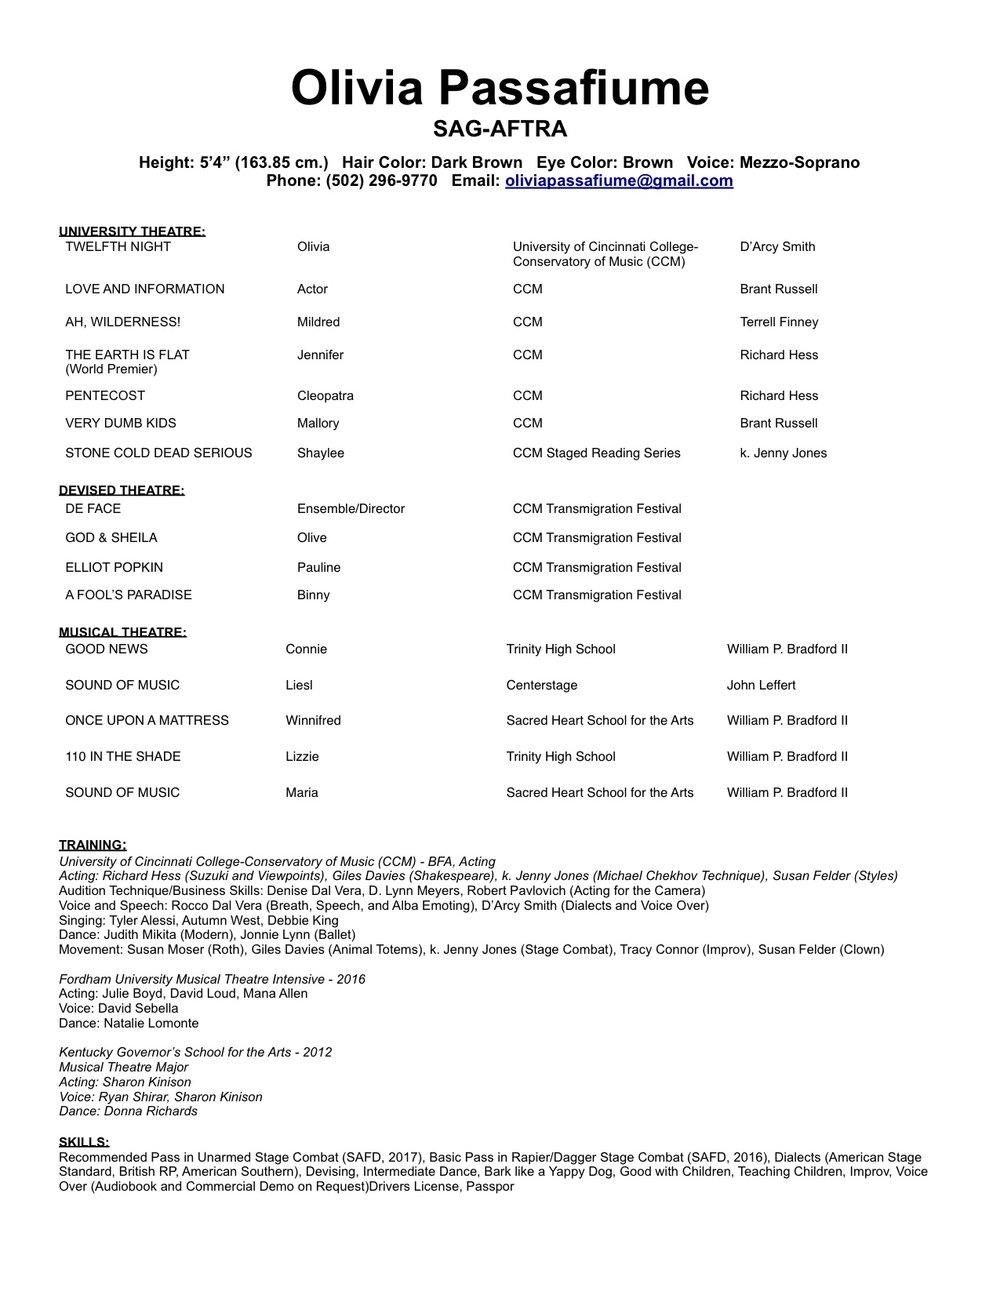 Olivia Passafiume Resume (Feb. 2018)-2.jpg